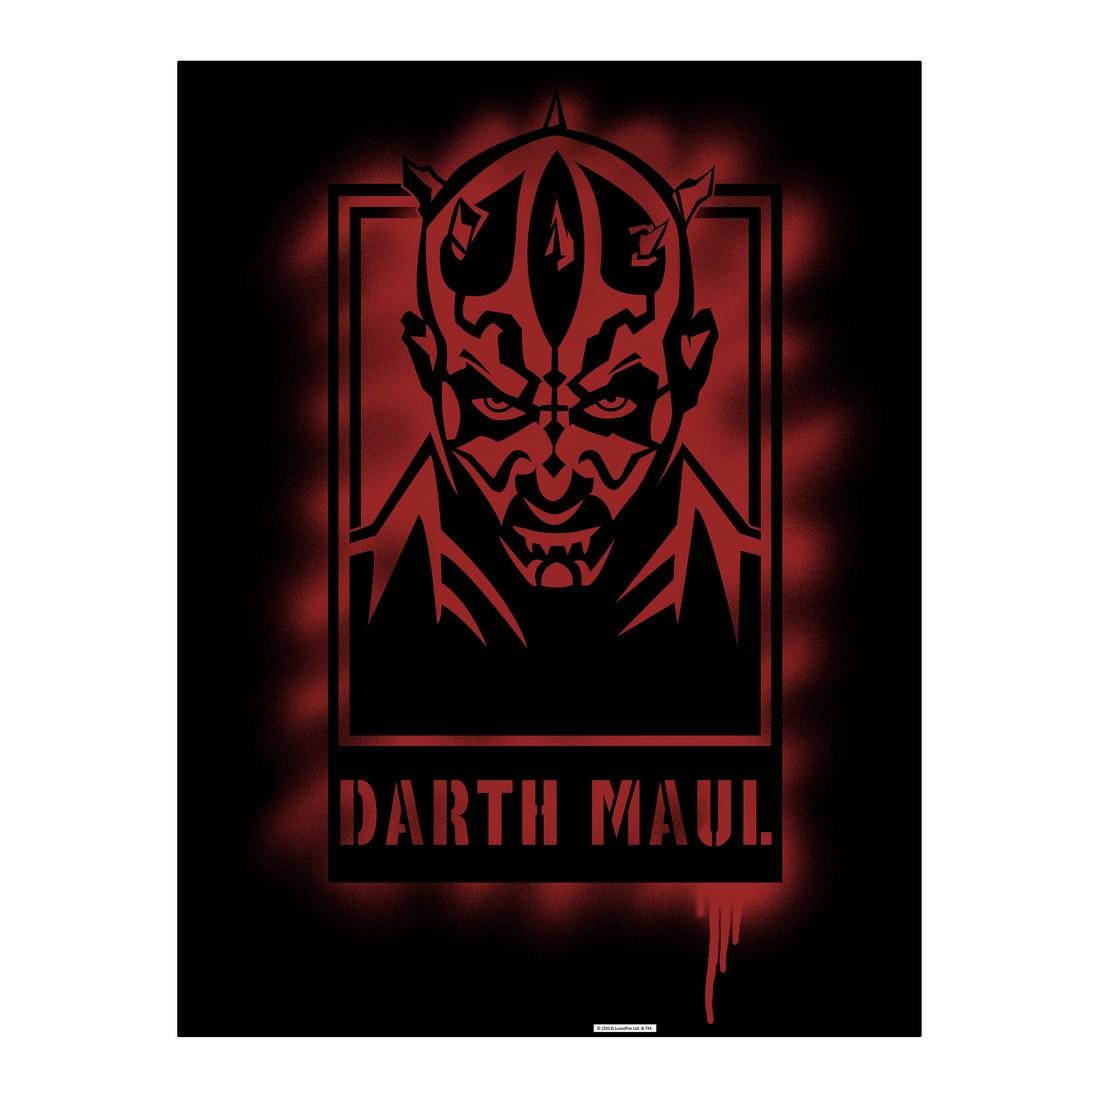 Leinwandbild Darth Maul Artwork – 100×75 cm, Gallery of Innovative Art bestellen